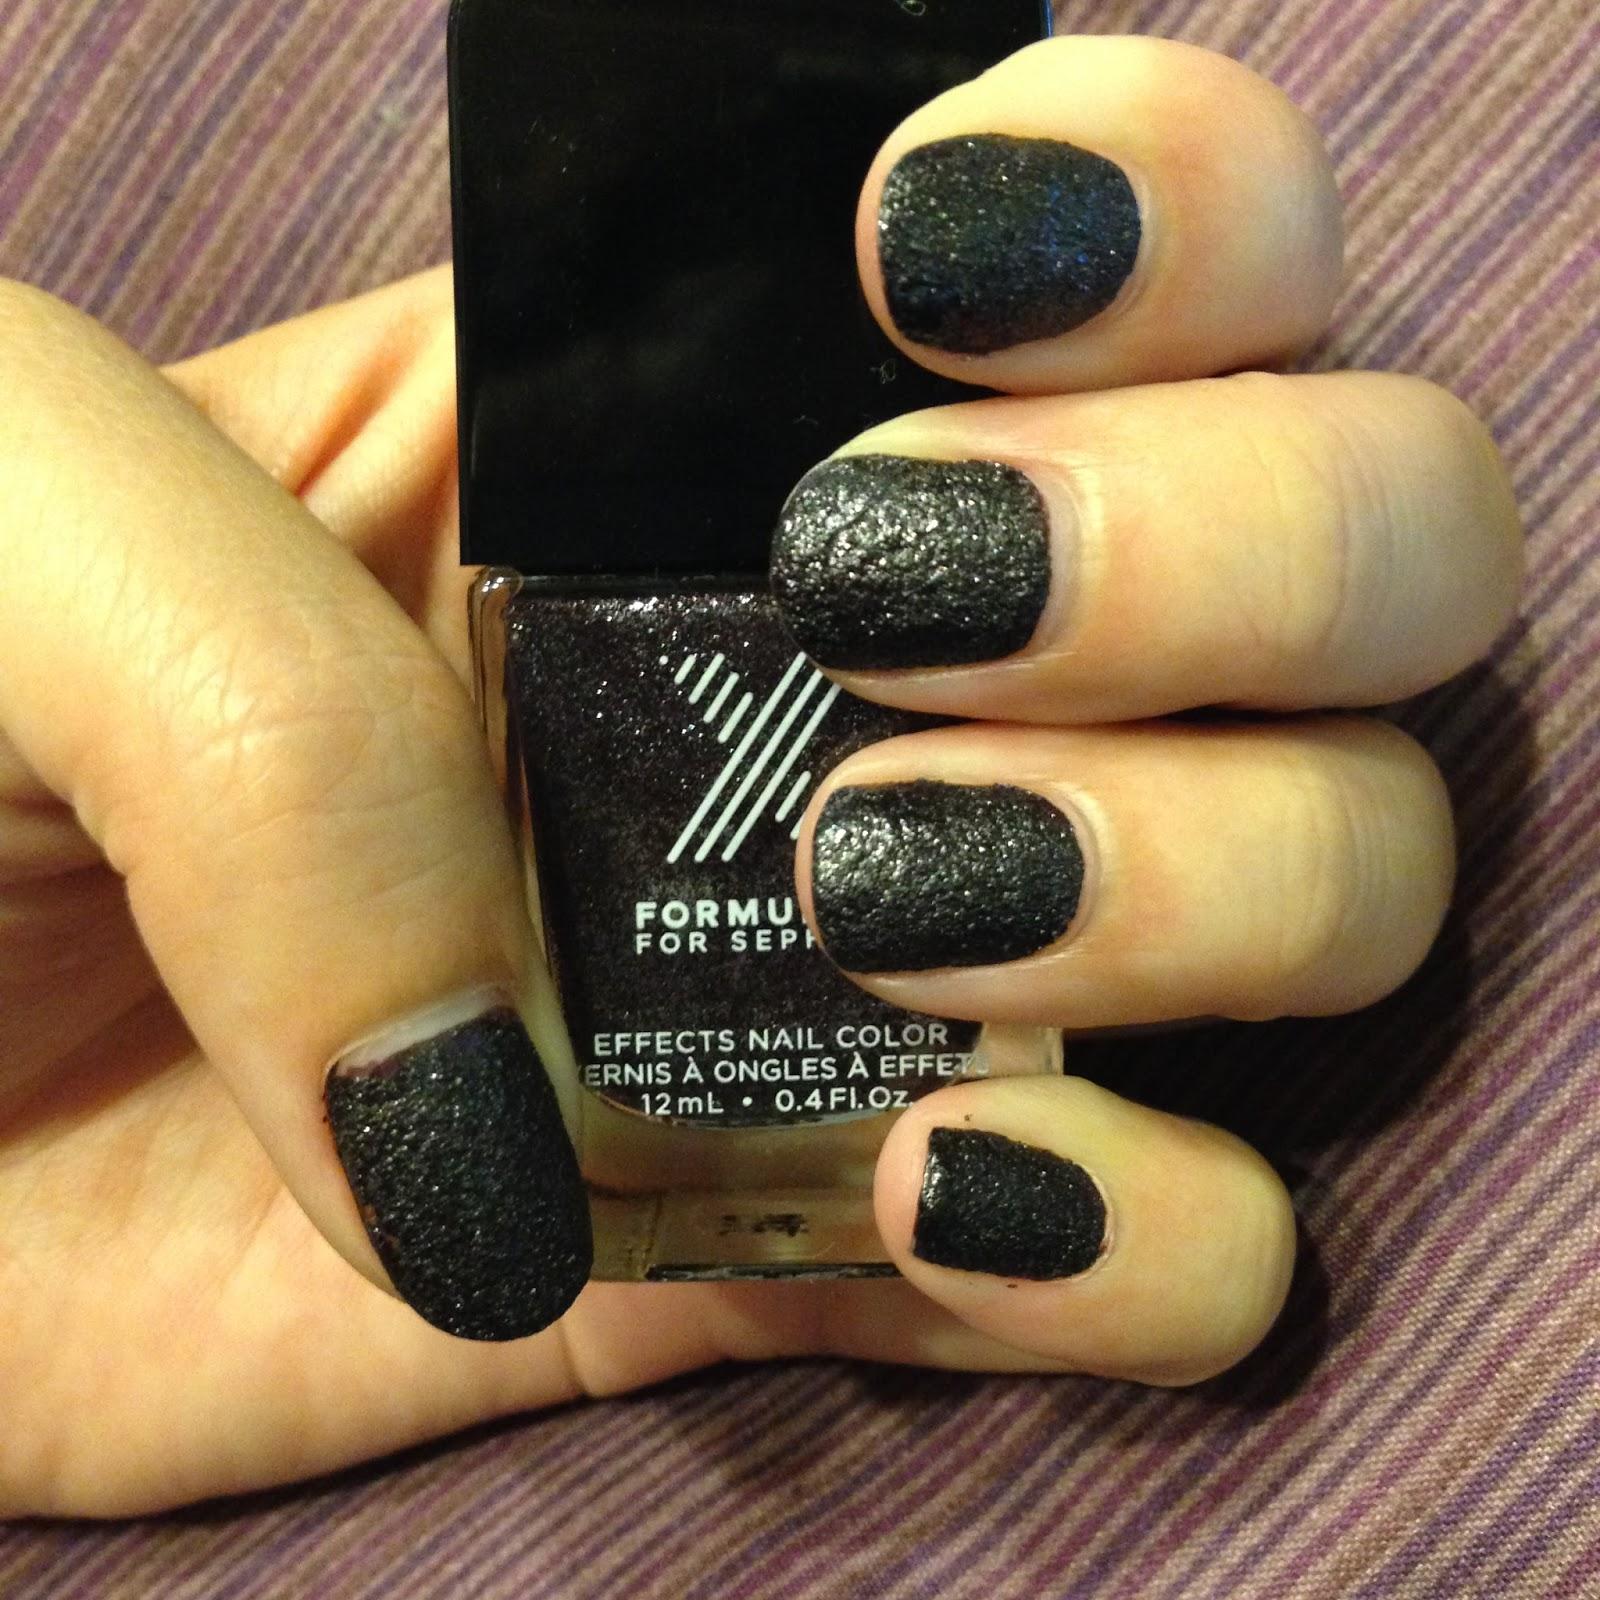 lovelifeoutloud: Nails of the Week #42: Formula X Black Hole